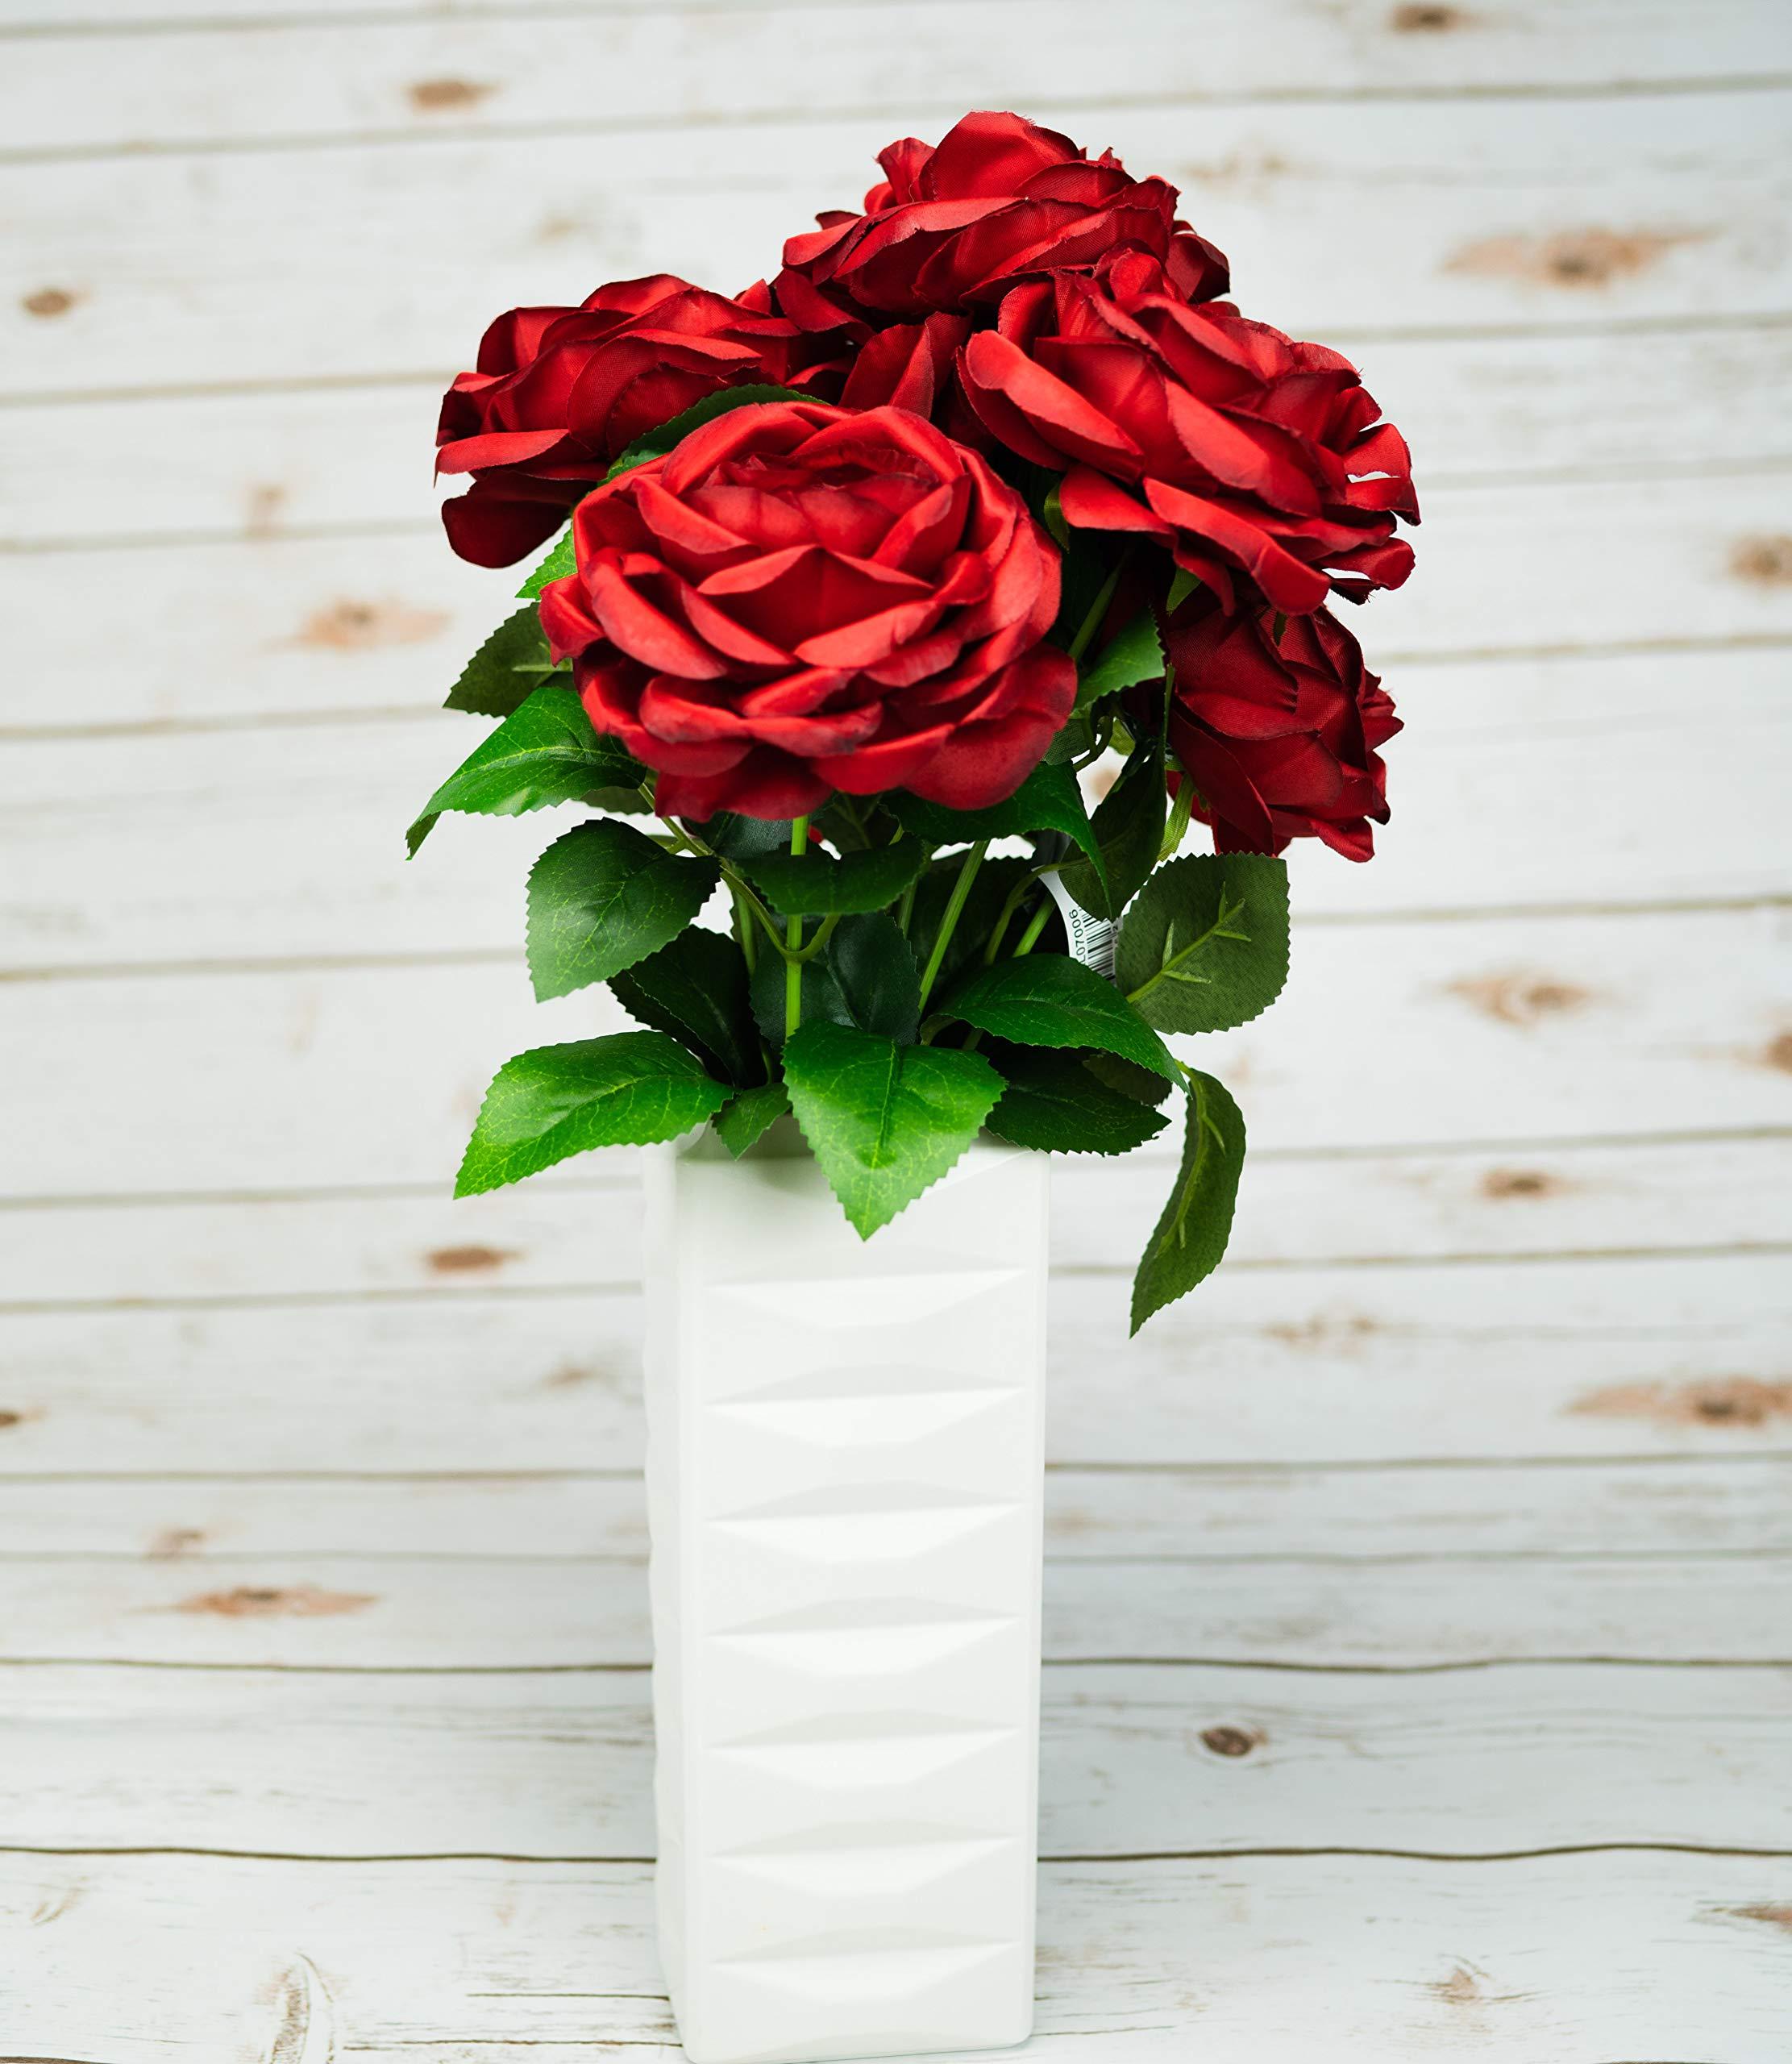 OOKi-Artificial Fake Flowers 1 Bouquet with 6 Silk 6″ Big Rose Head Flower Arrangements Wedding Bouquets Decorations Plastic Floral Table Centerpieces Home Kitchen Garden Party Décor (Red)